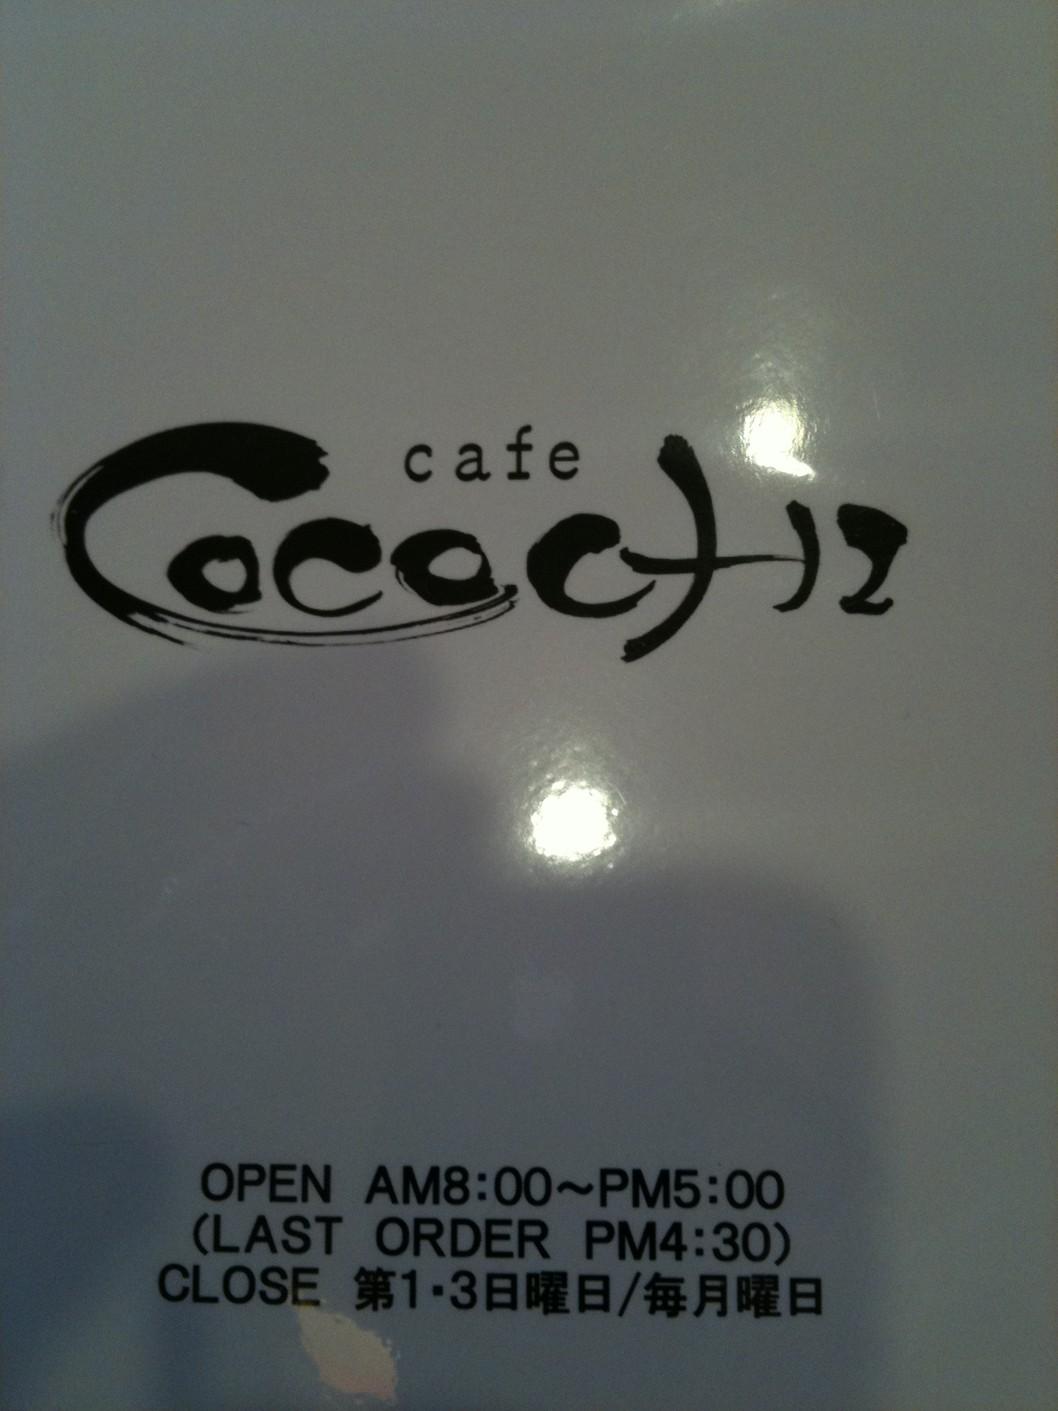 CAFE COCOCHI